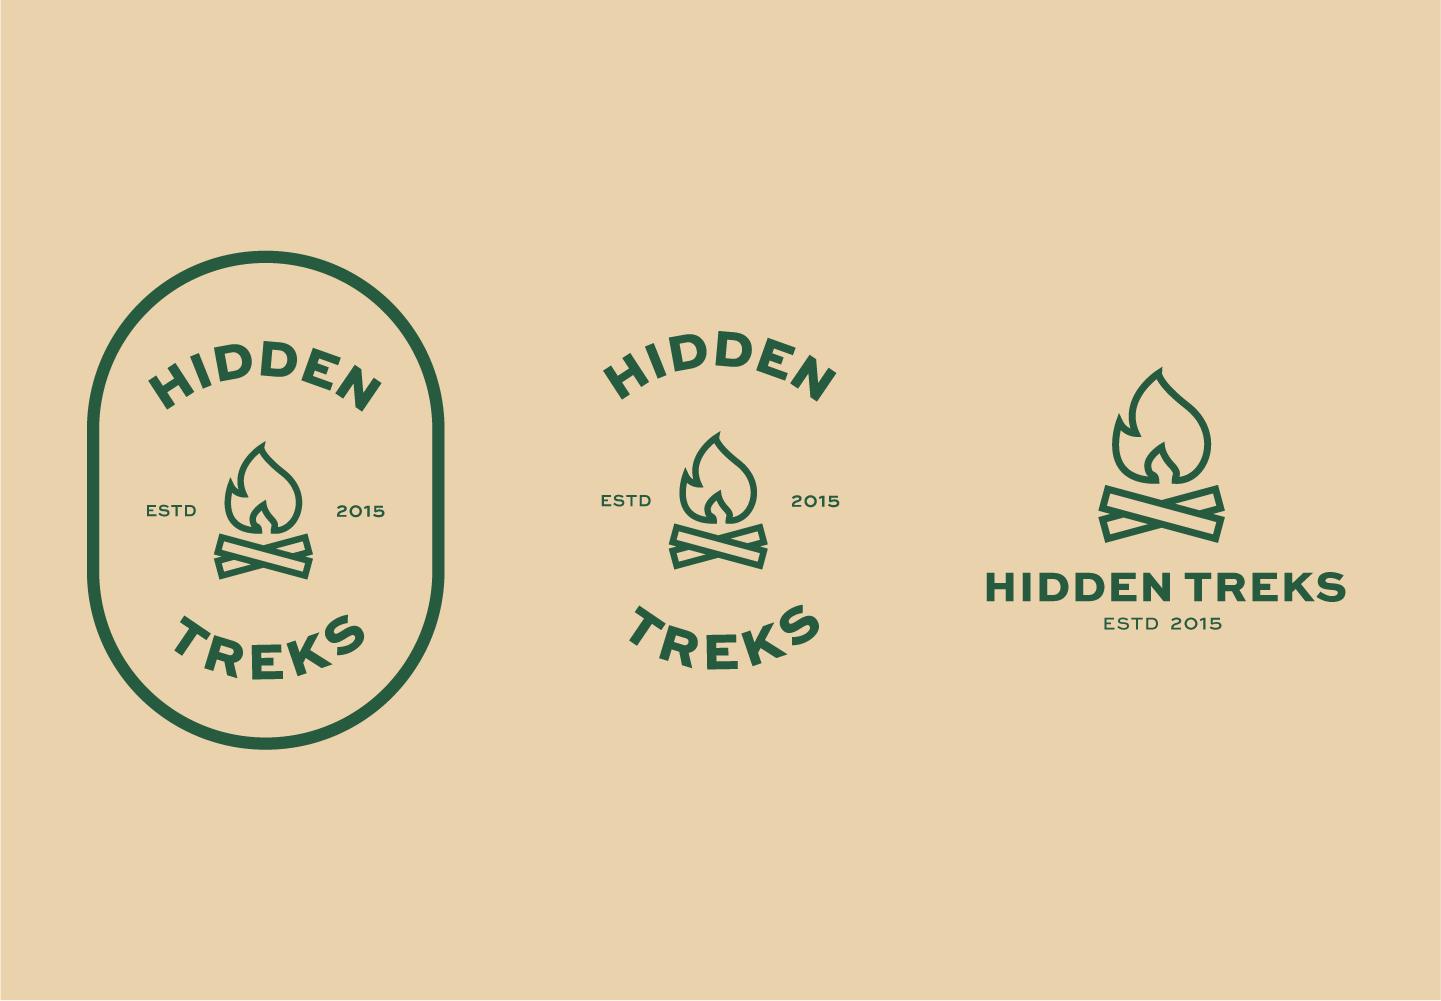 3 logos saying Hidden Treks